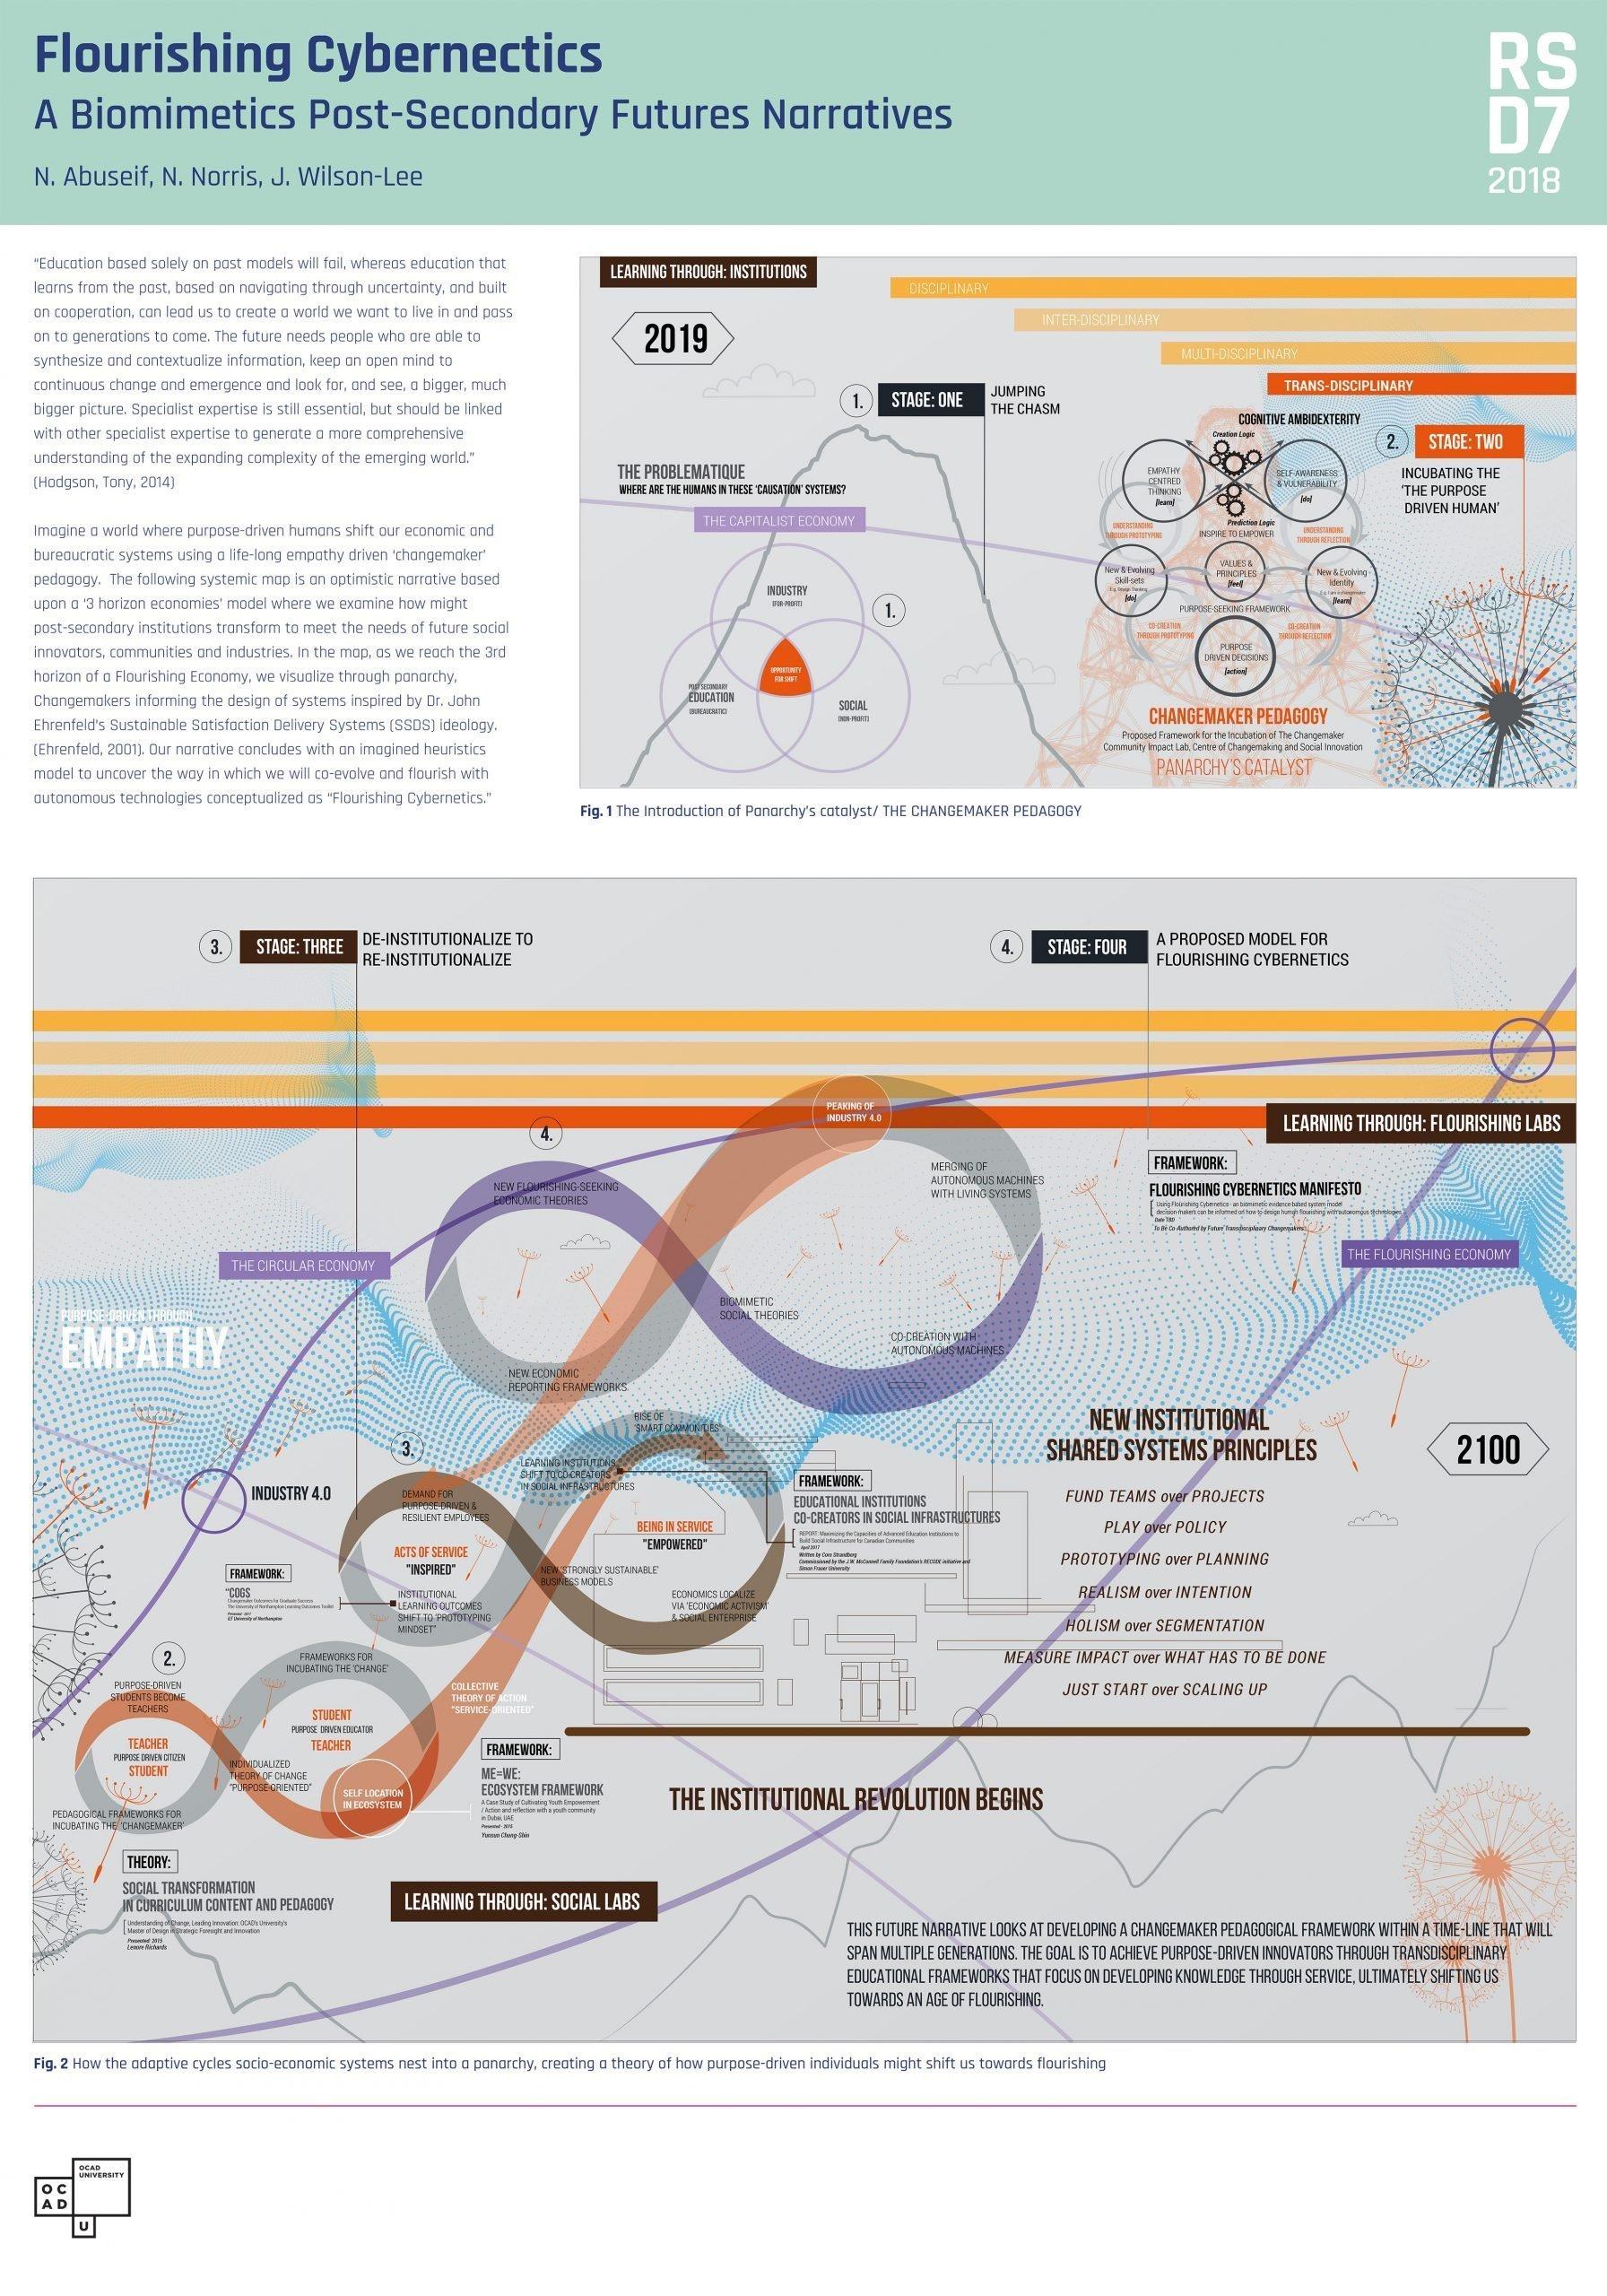 Flourishing Cybernetics systems map